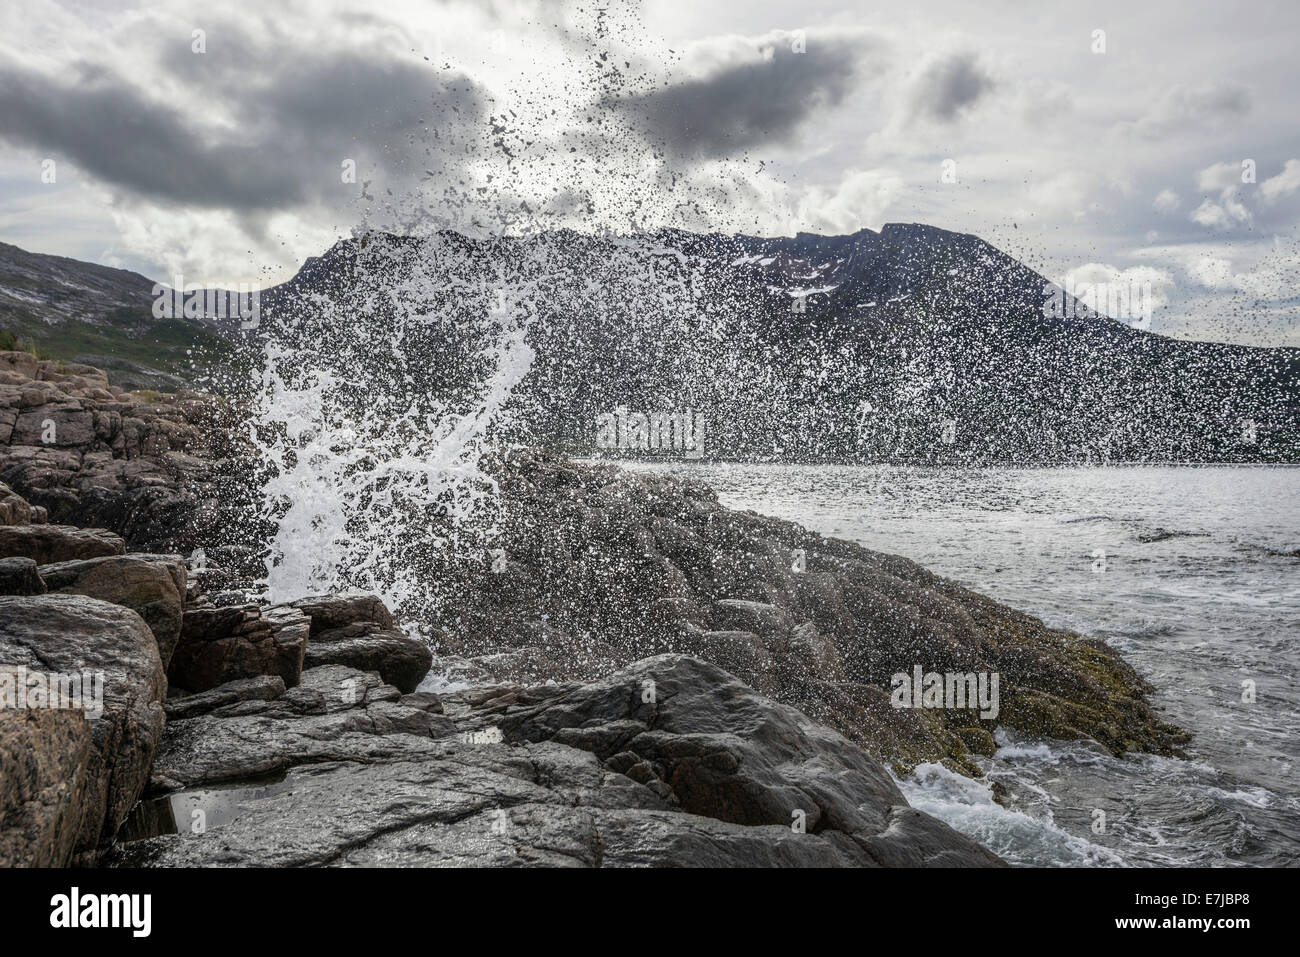 Blowhole on the coast, island of Senja, Troms, Norway - Stock Image